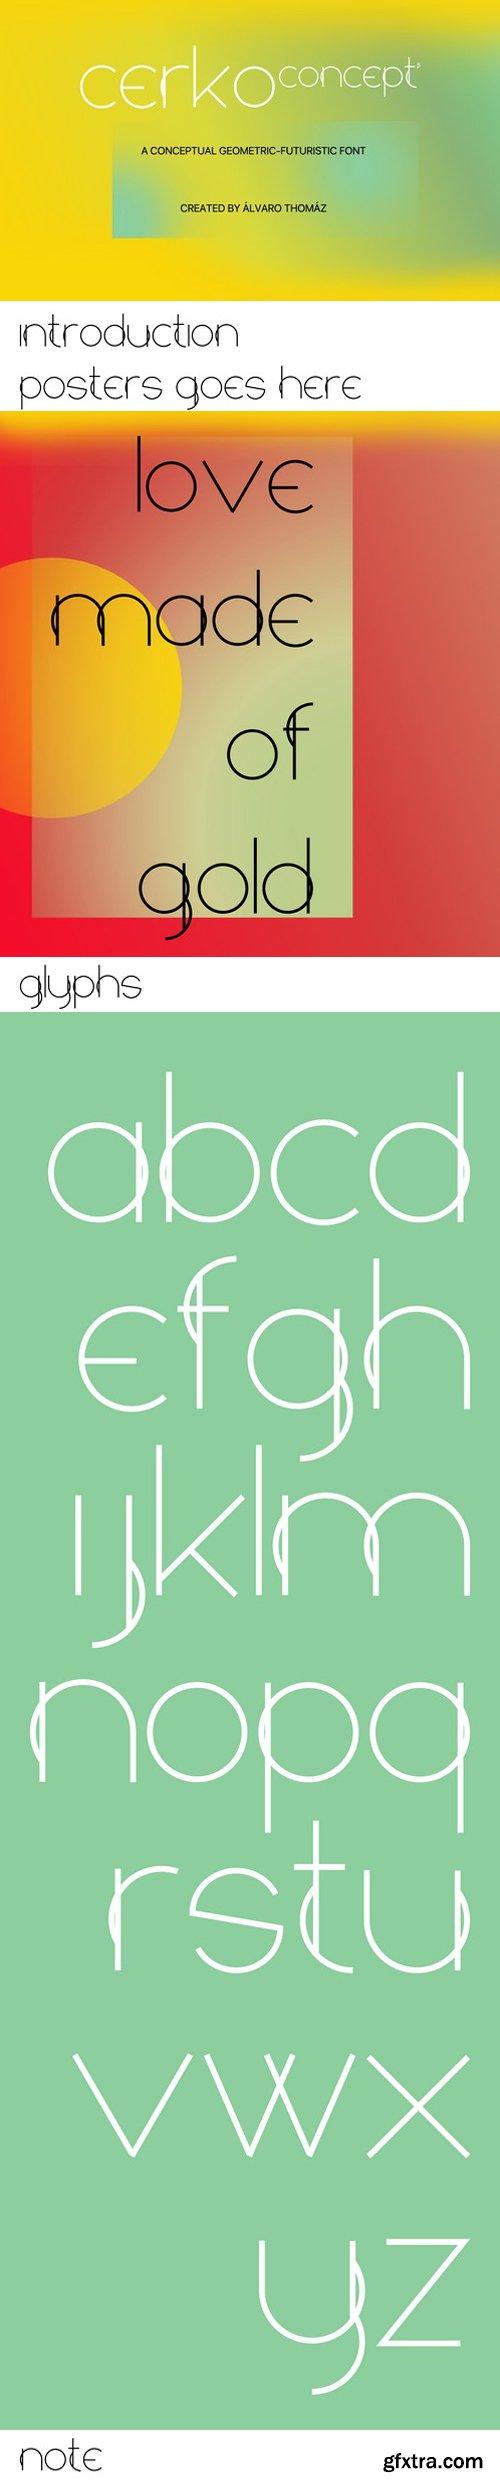 Cerko - geometric-futuristic font